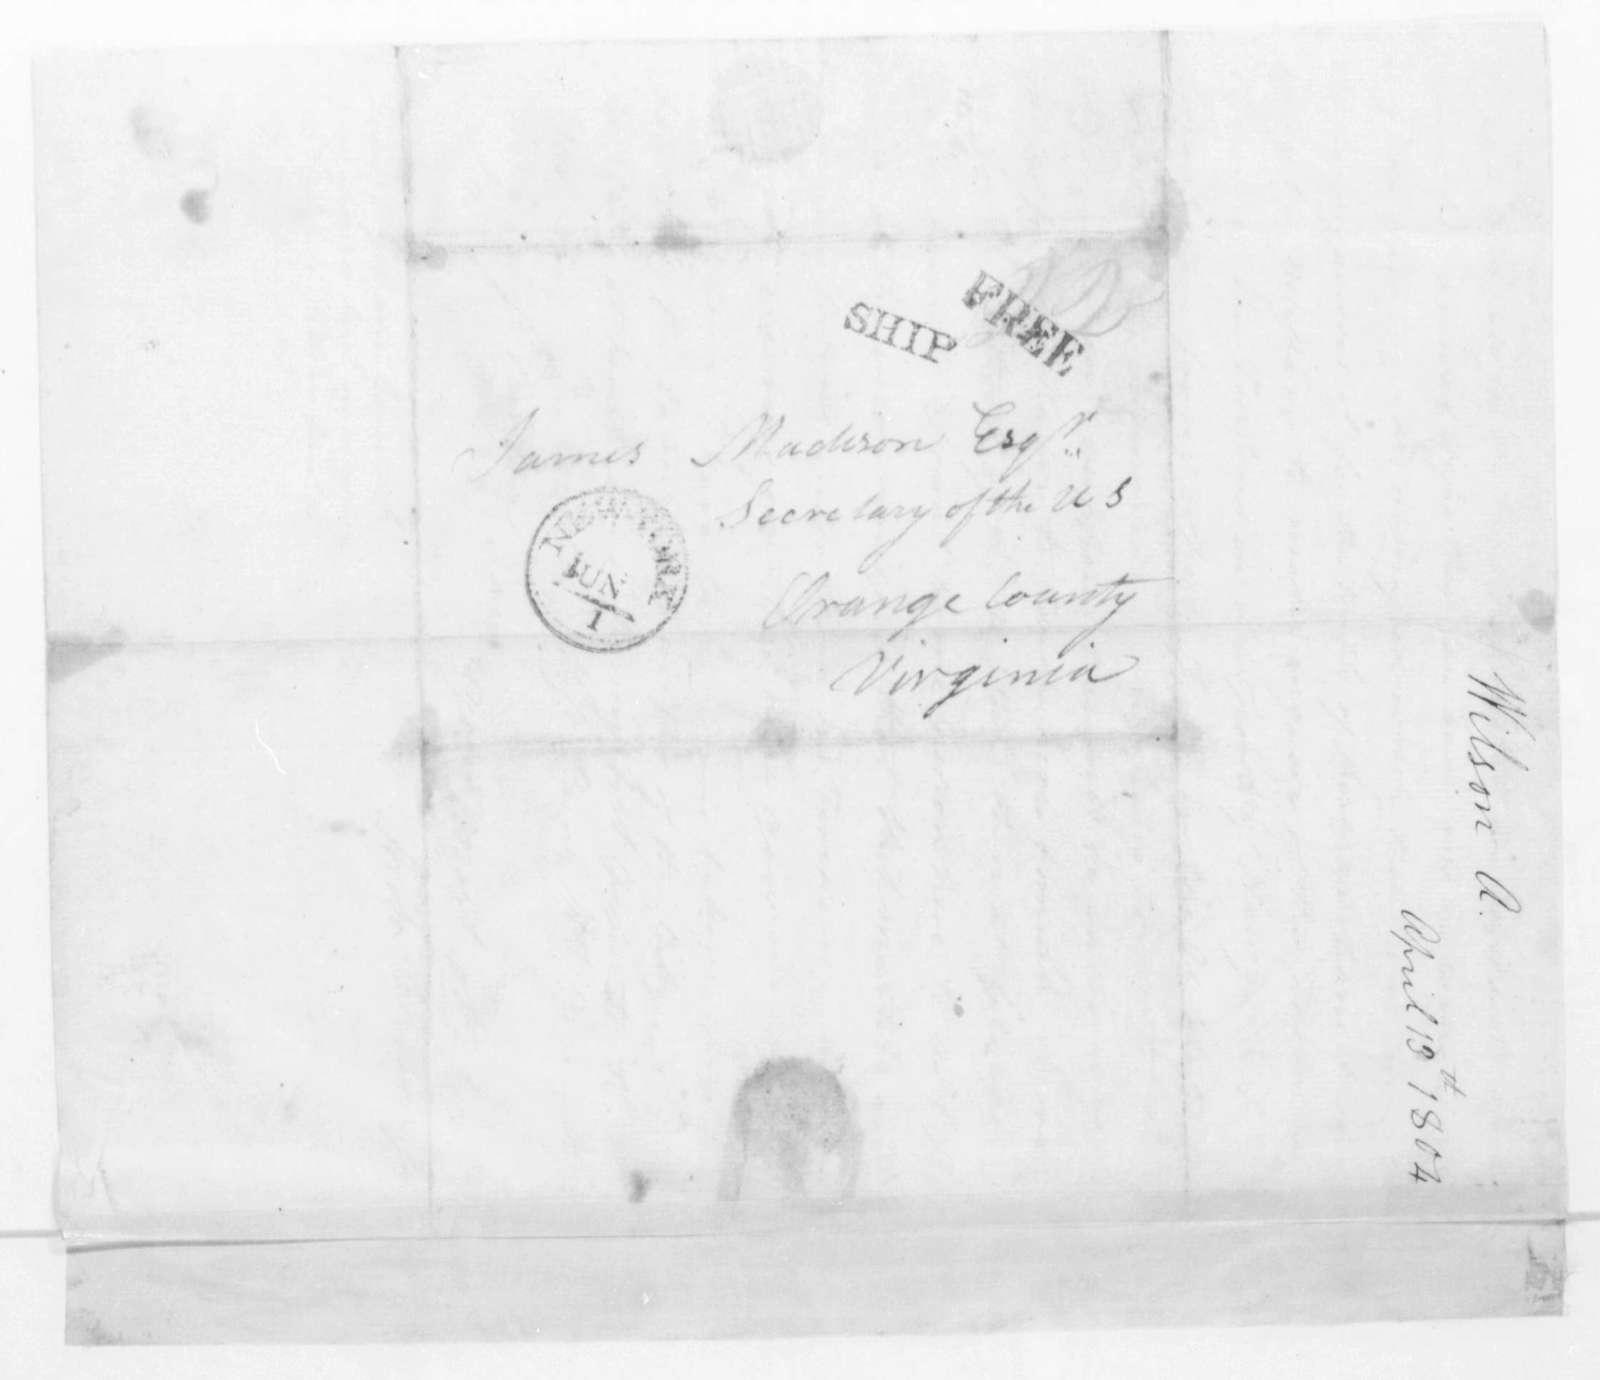 Archibald Wilson Jr. to James Madison, April 13, 1804.